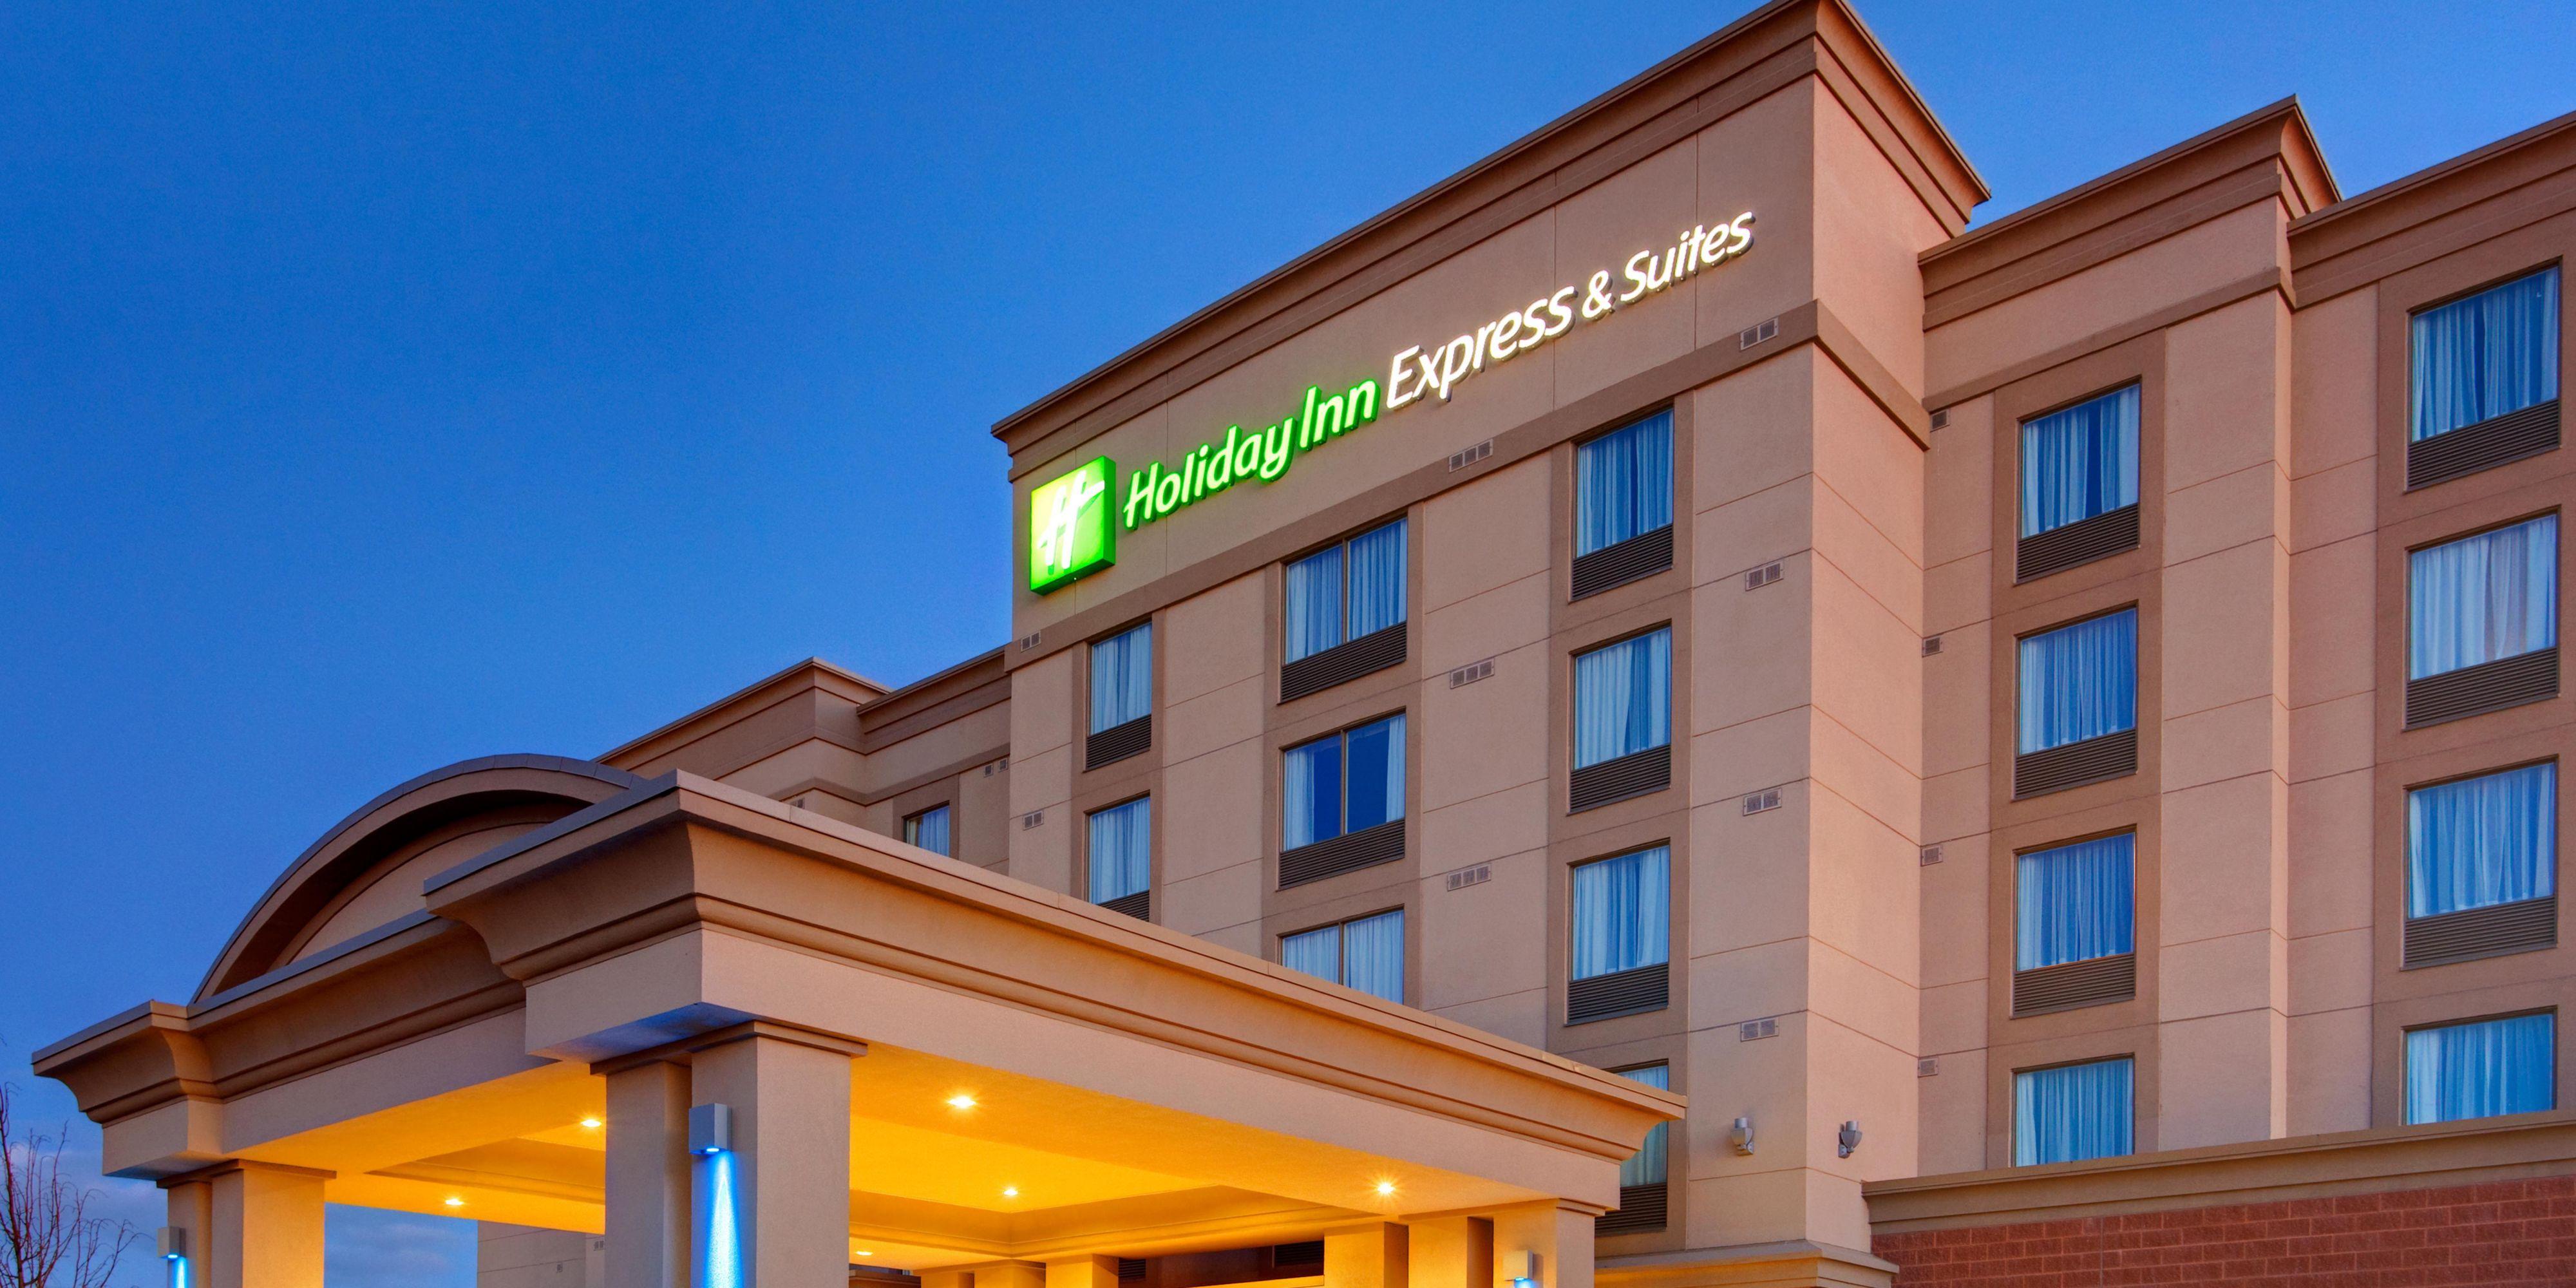 Holiday Inn Express U0026 Suites Newmarket